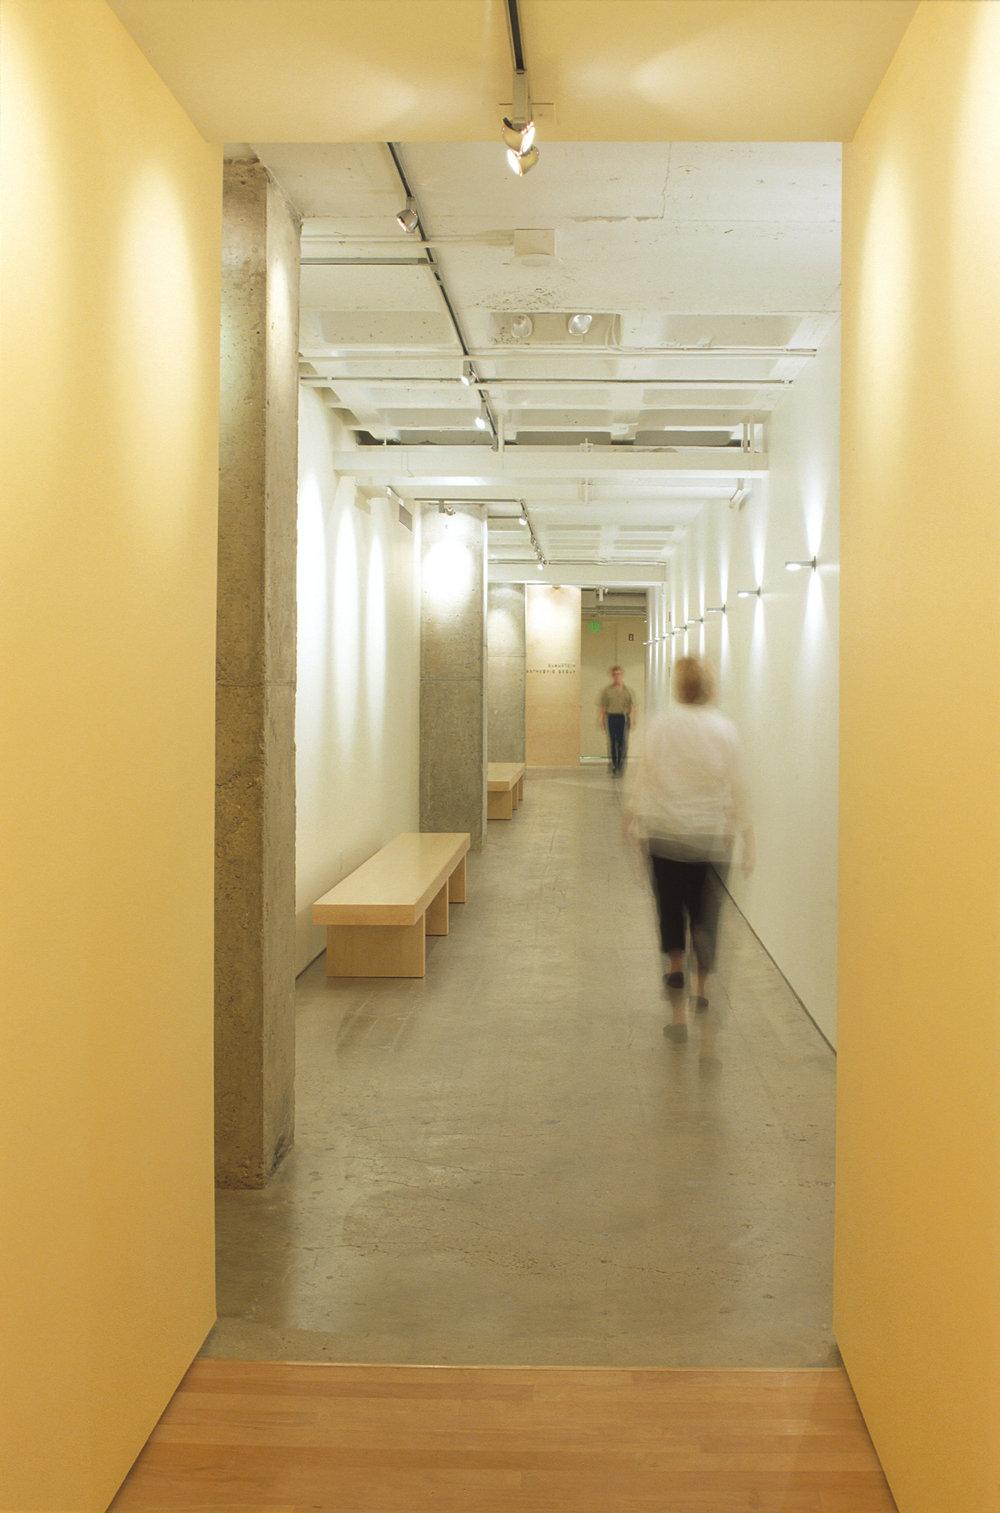 05-BPG-corridor-new-blur-djr-5.jpg